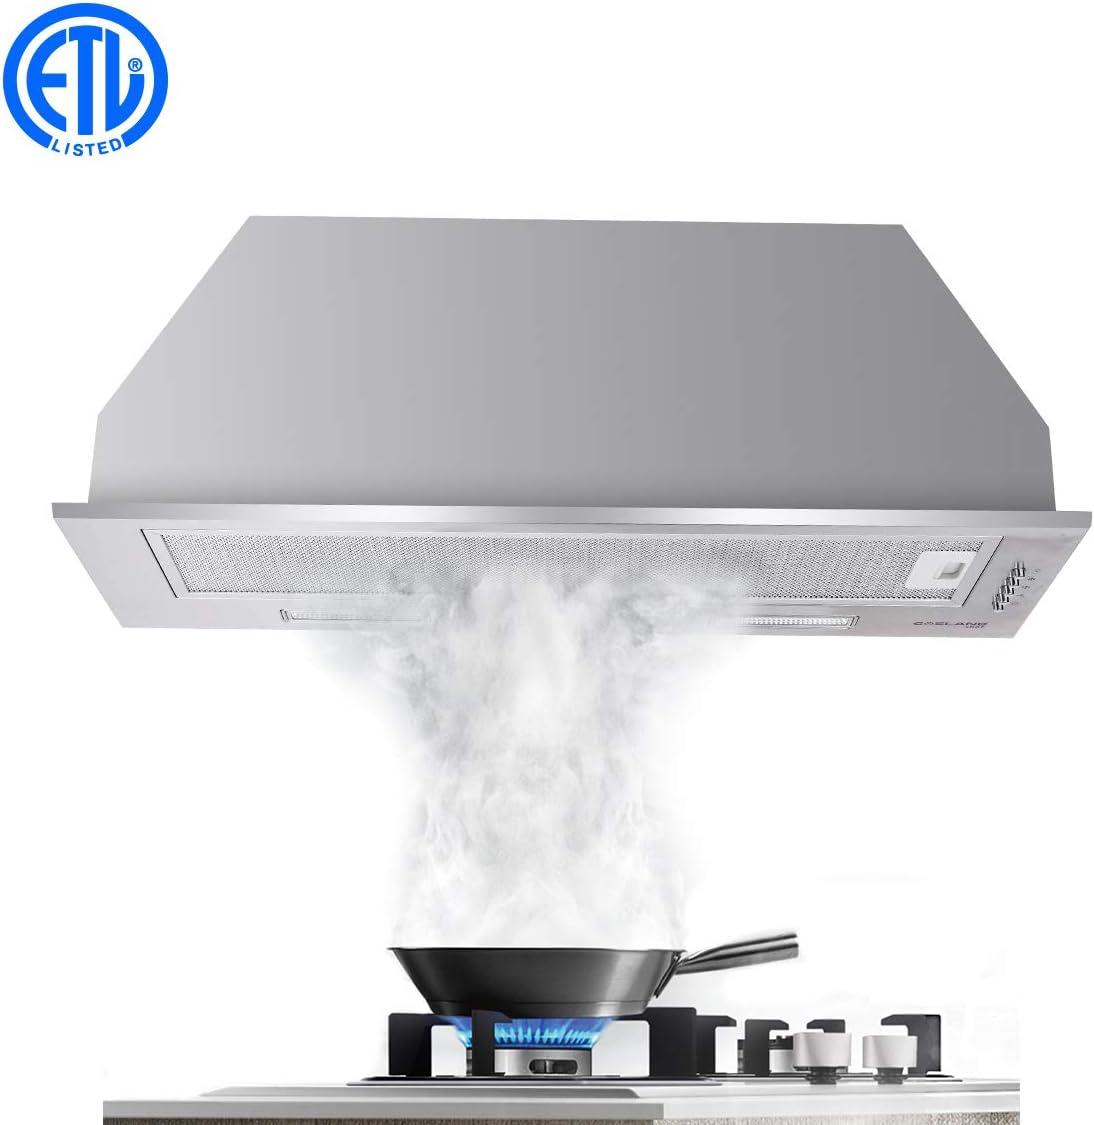 Campana GASLAND Chef BI30SP de 30 pulgadas, campana de cocina integrada de acero inoxidable, 3 velocidades, 450 cfm, botón de control de empuje, ventilador de escape, luces LED, filtro de malla de